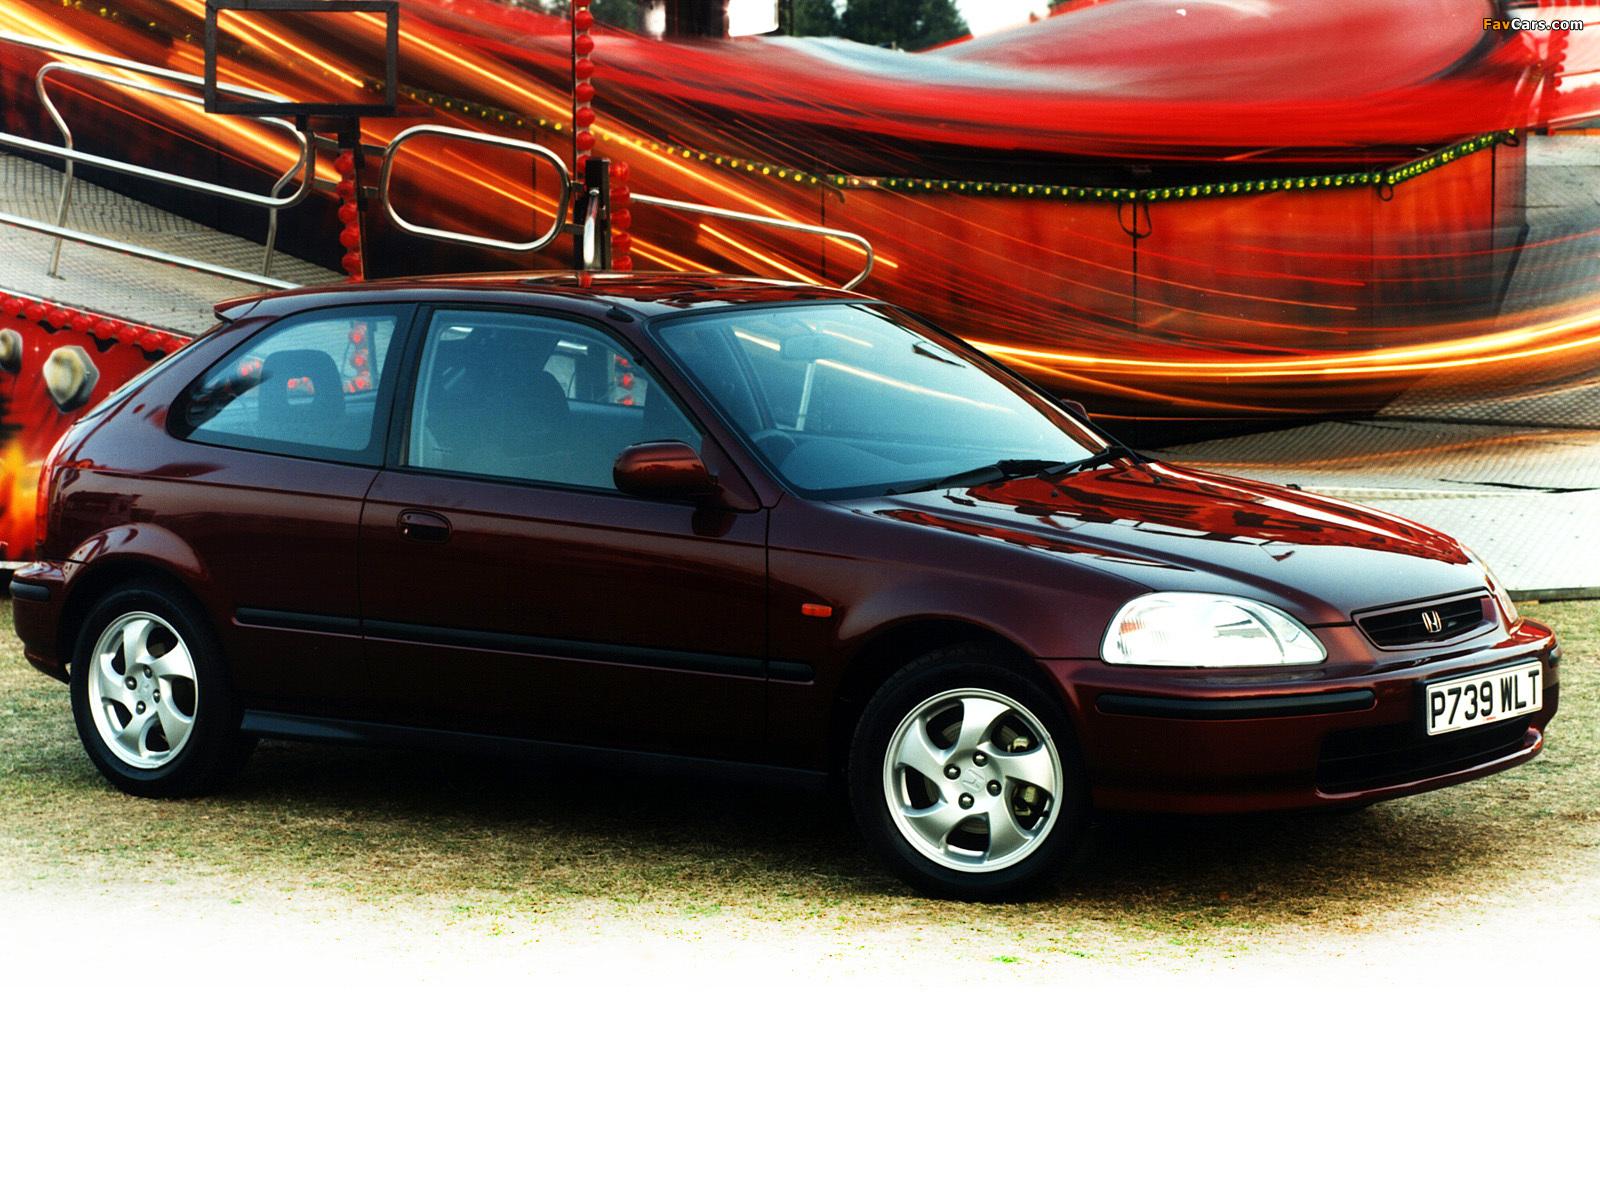 Honda Civic Hatchback 2001 Honda civic hatchback uk-spec